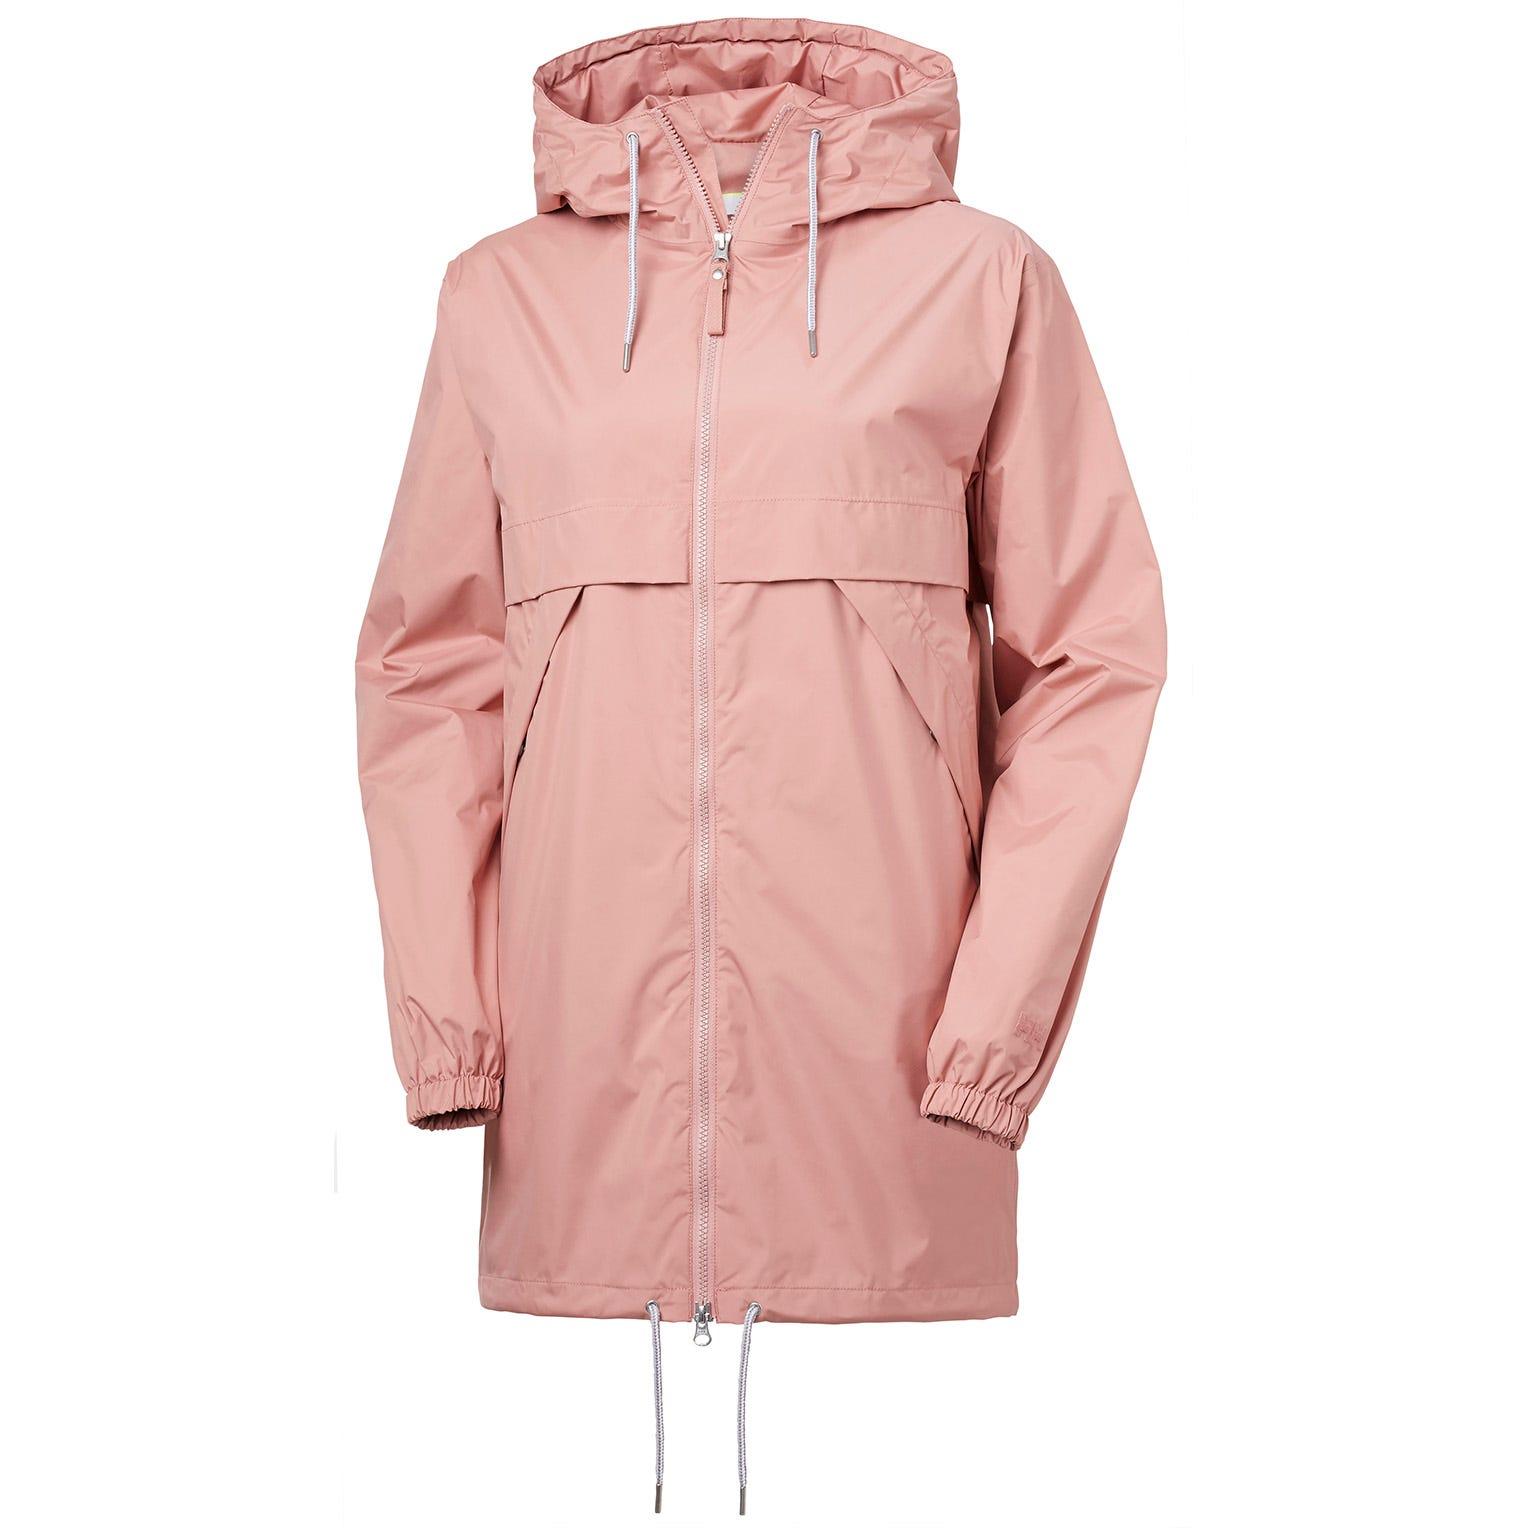 Helly Hansen Womens Jpn Classic Raincoat Pink XL